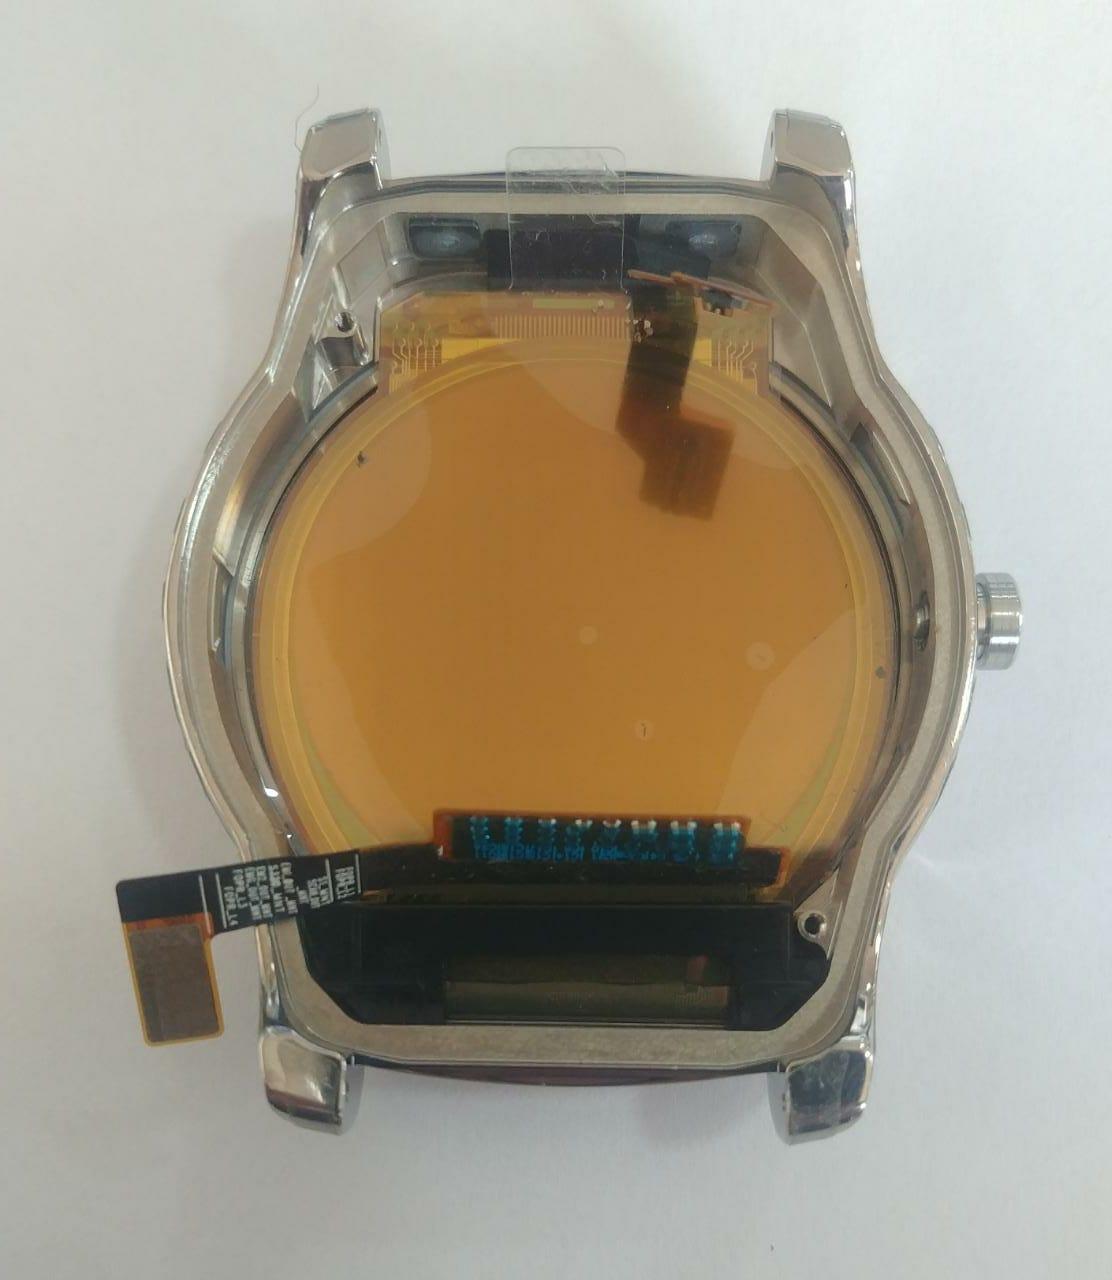 Módulo Aro Lcd Display Digital Relógio Urban W150 Novo